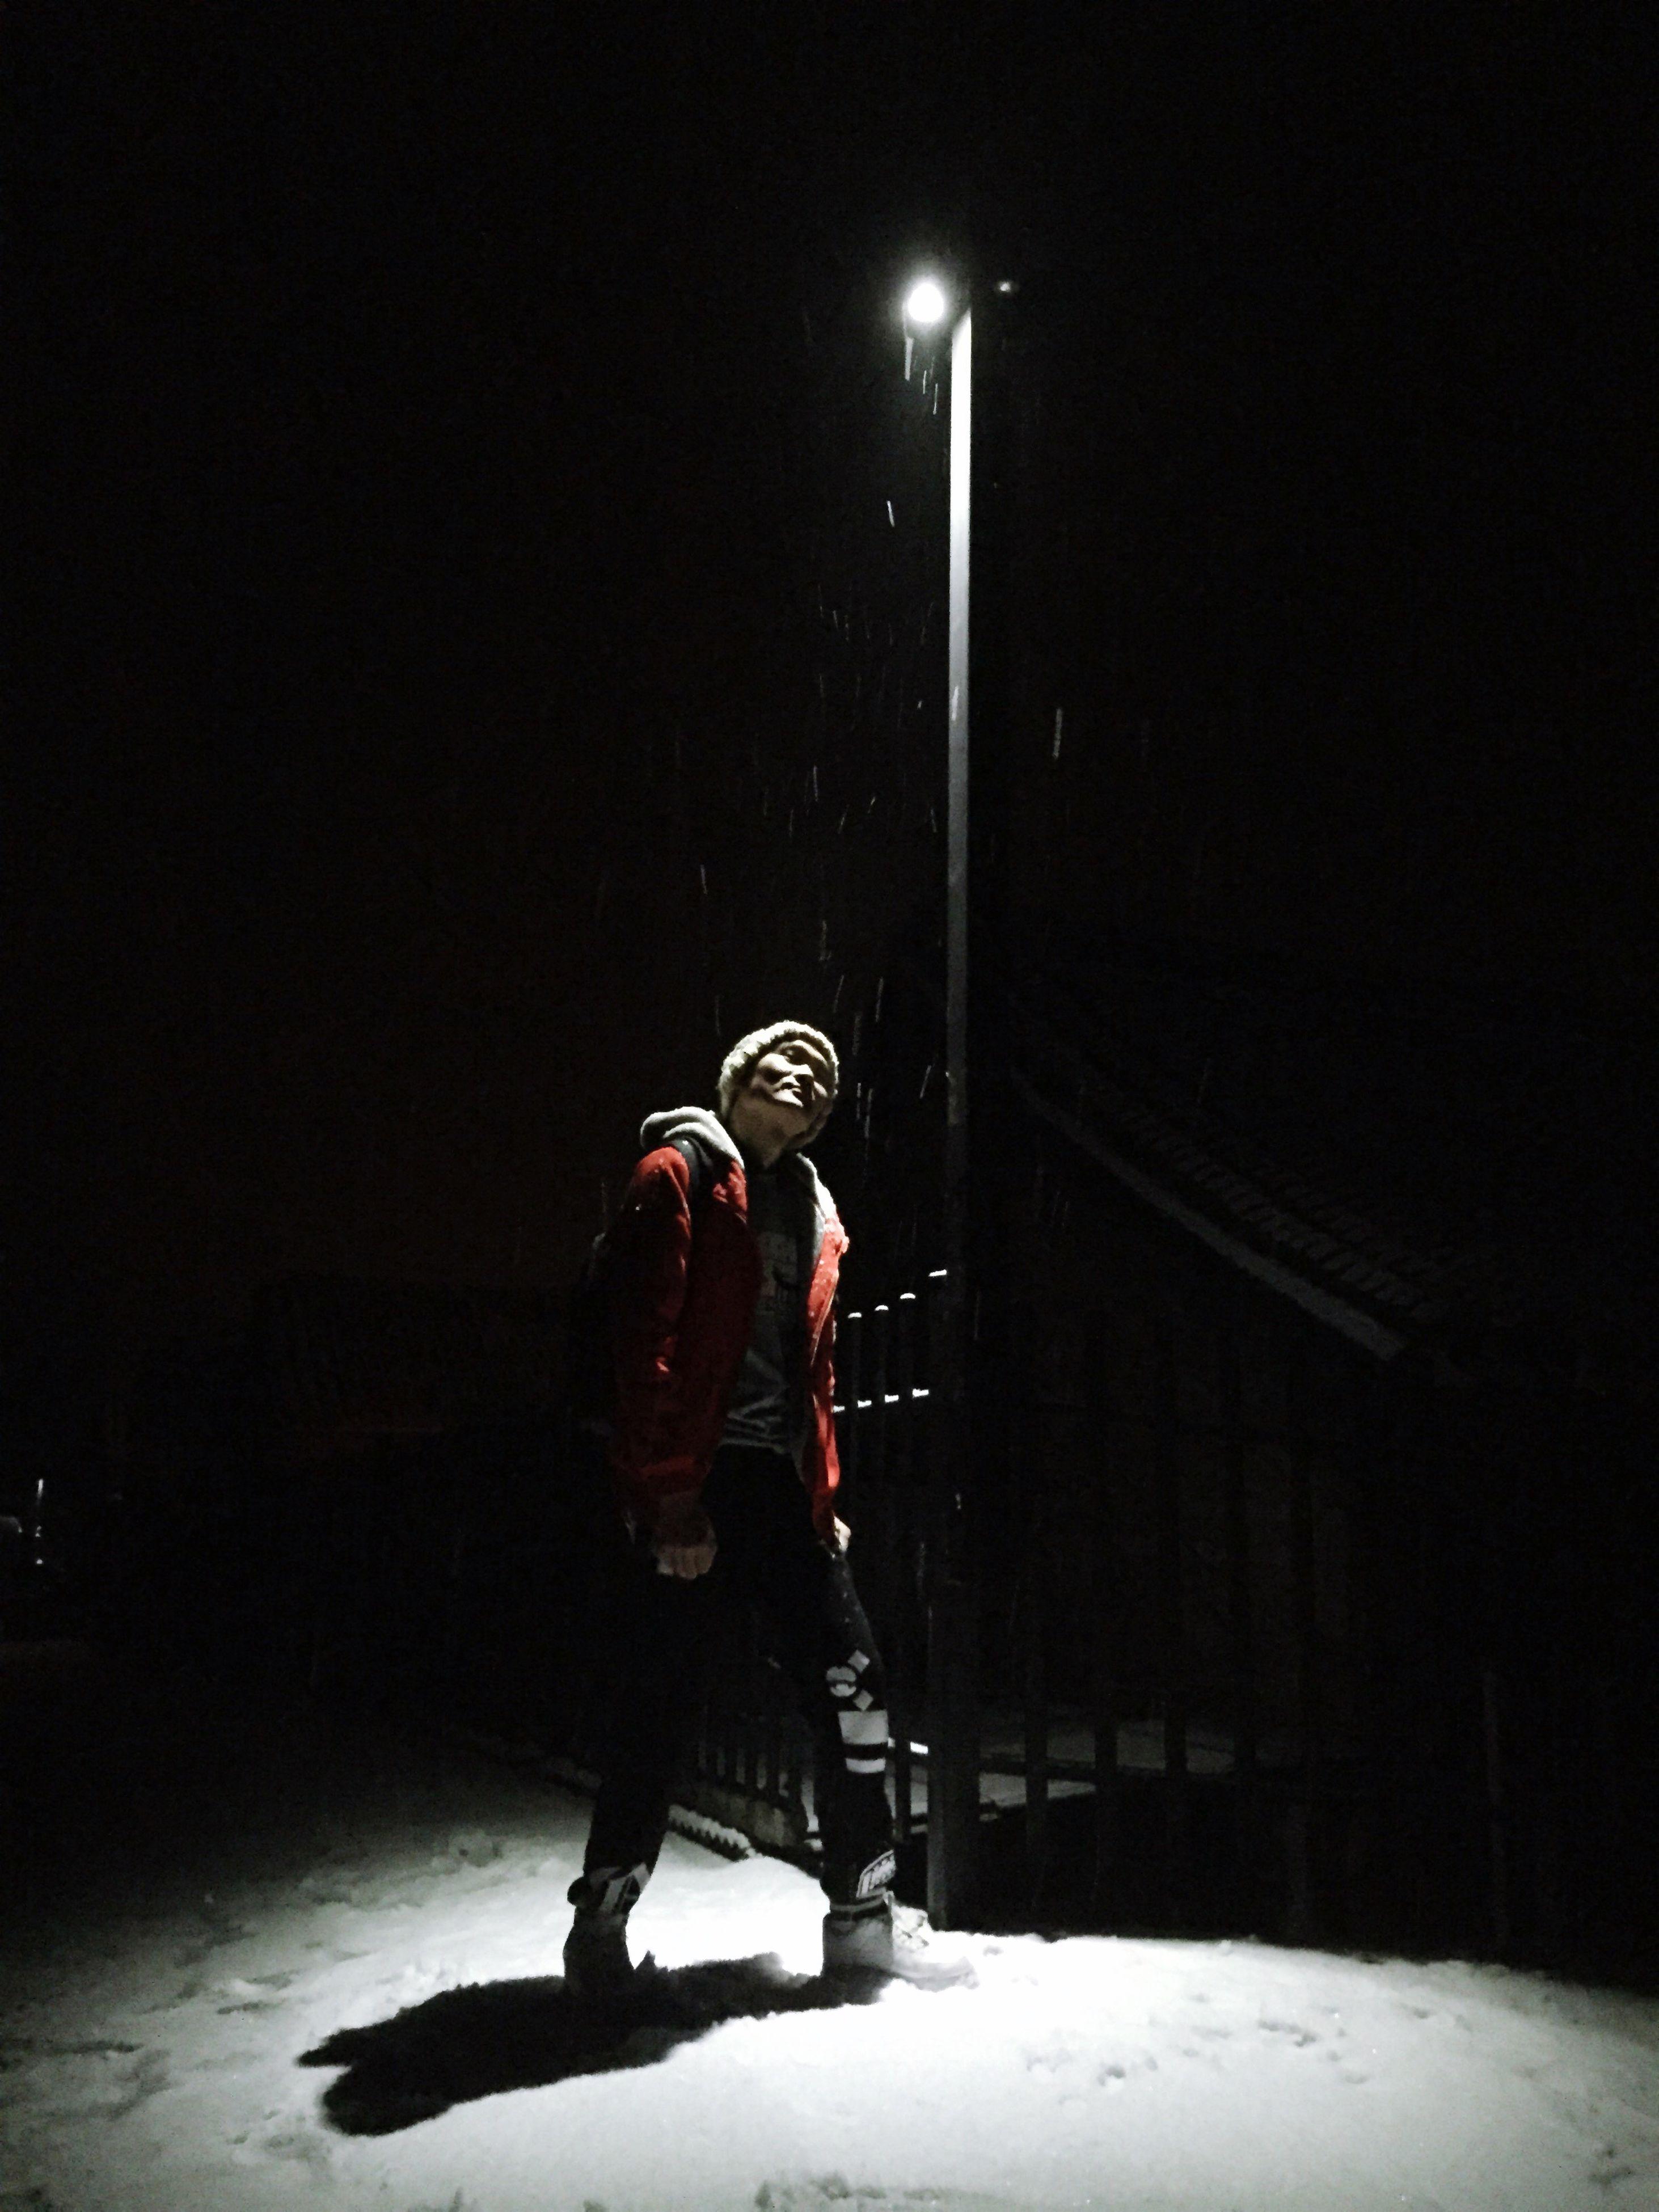 night, illuminated, full length, street light, lifestyles, leisure activity, lighting equipment, casual clothing, outdoors, season, dark, weather, sky, the way forward